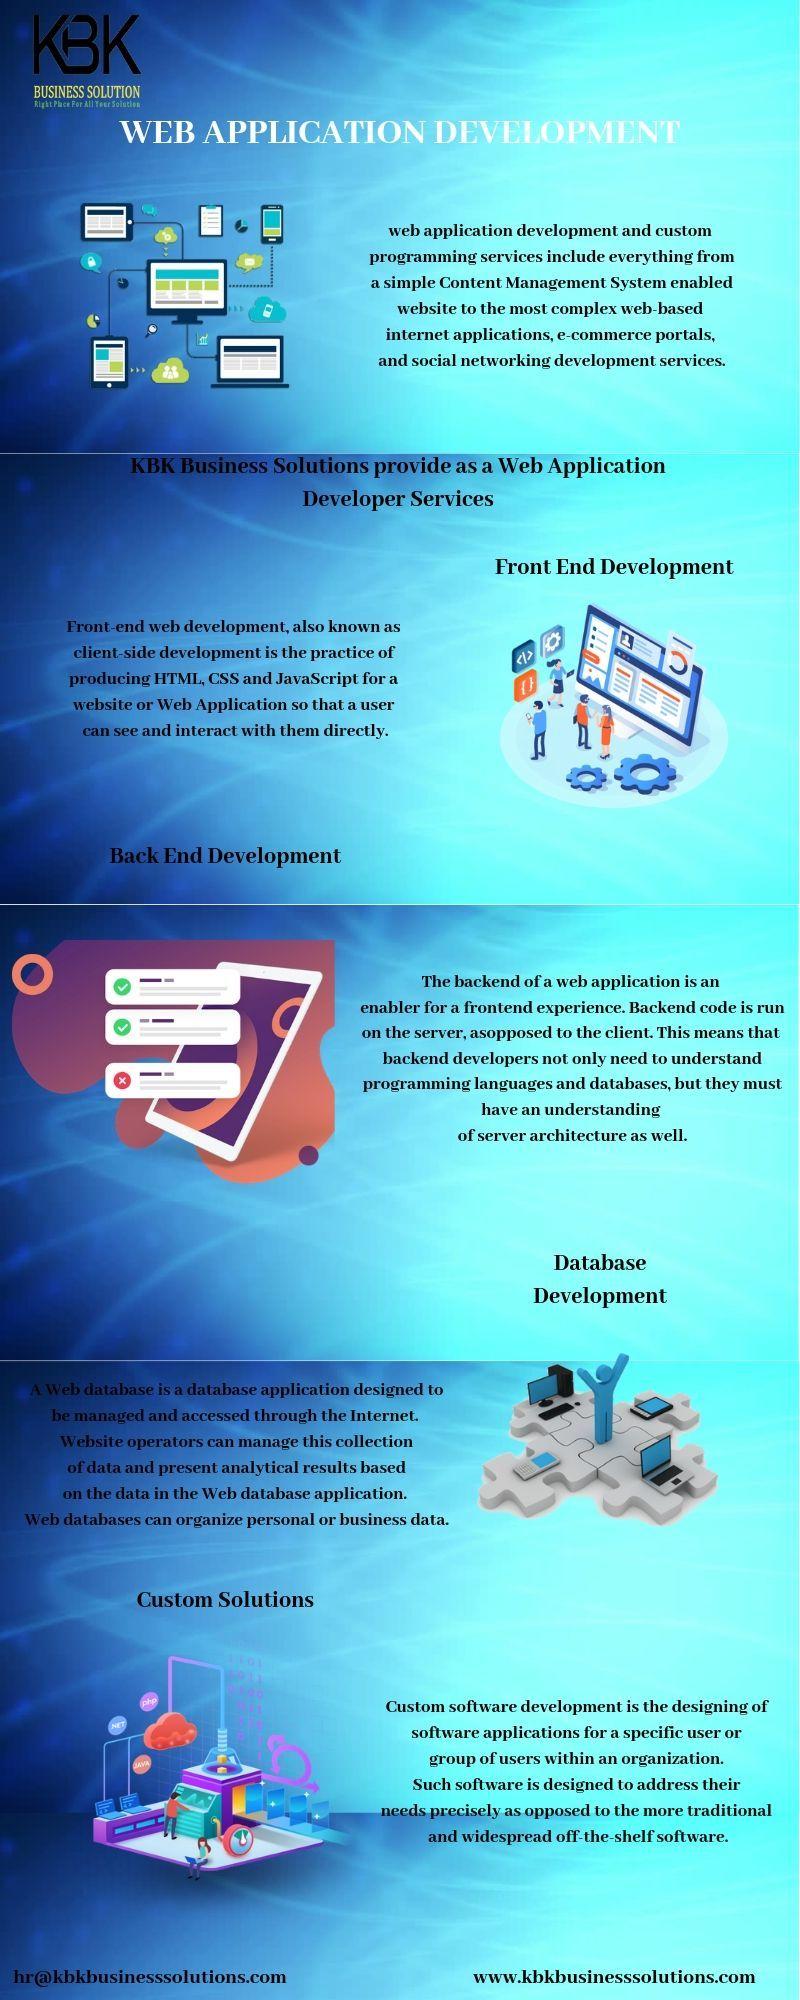 4e5c9d1b50c194f915bc312ba5b3c580 - Can We Develop Web Application Using Java